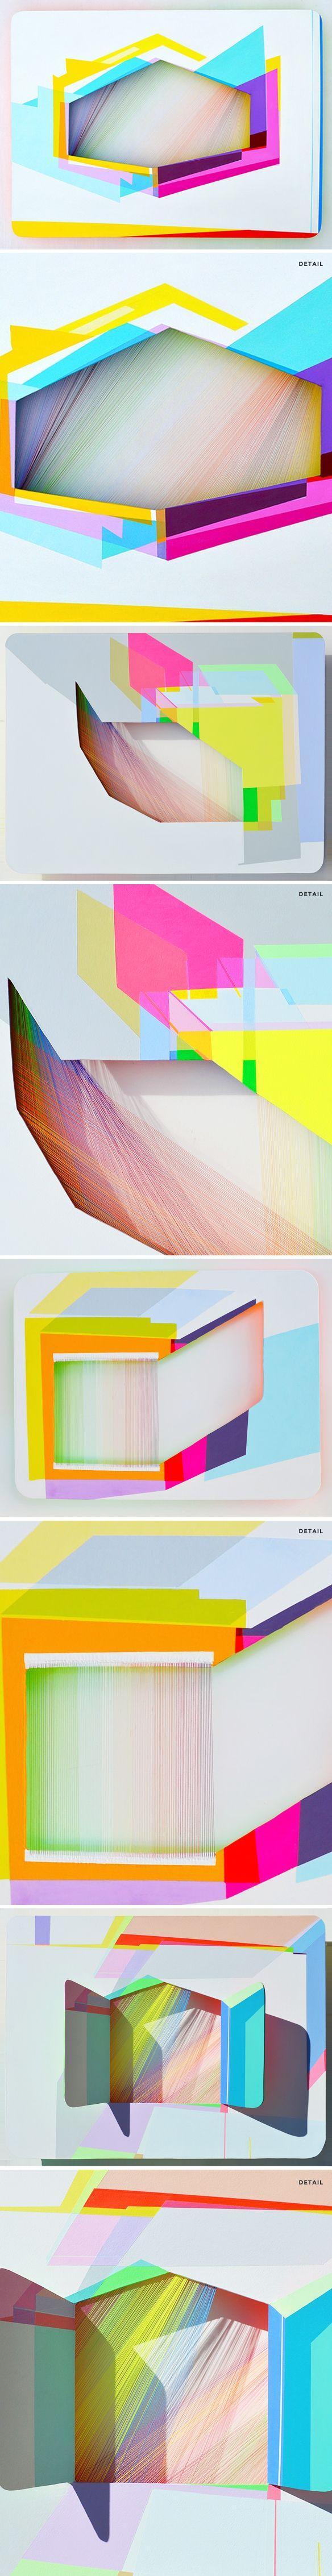 xuan chen - thread, paint, aluminum <3